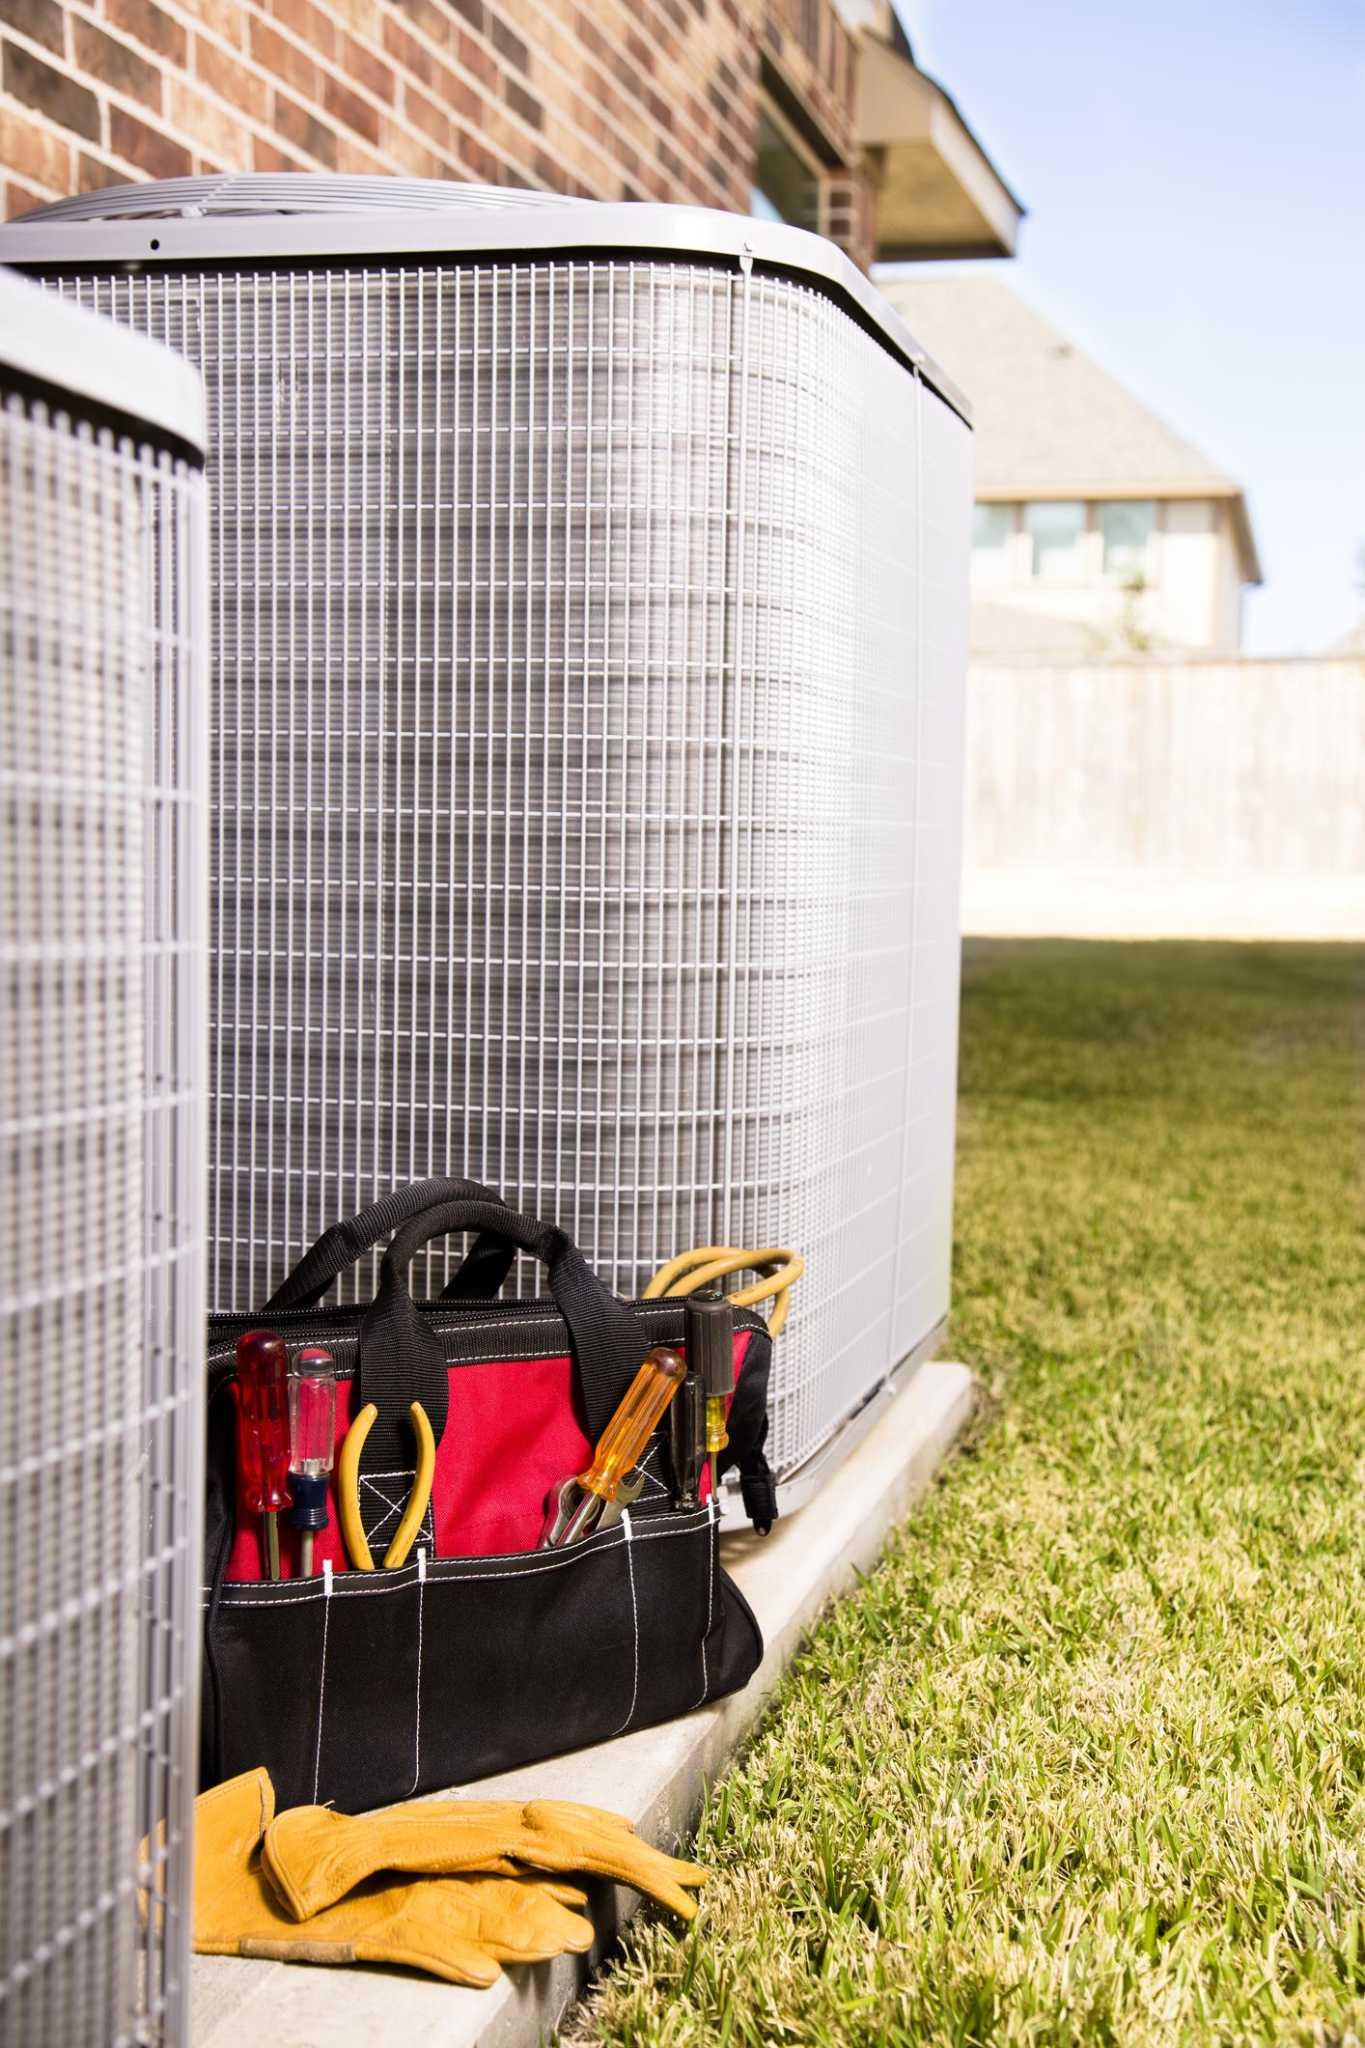 Utilities venture off power grid for home warranty revenue